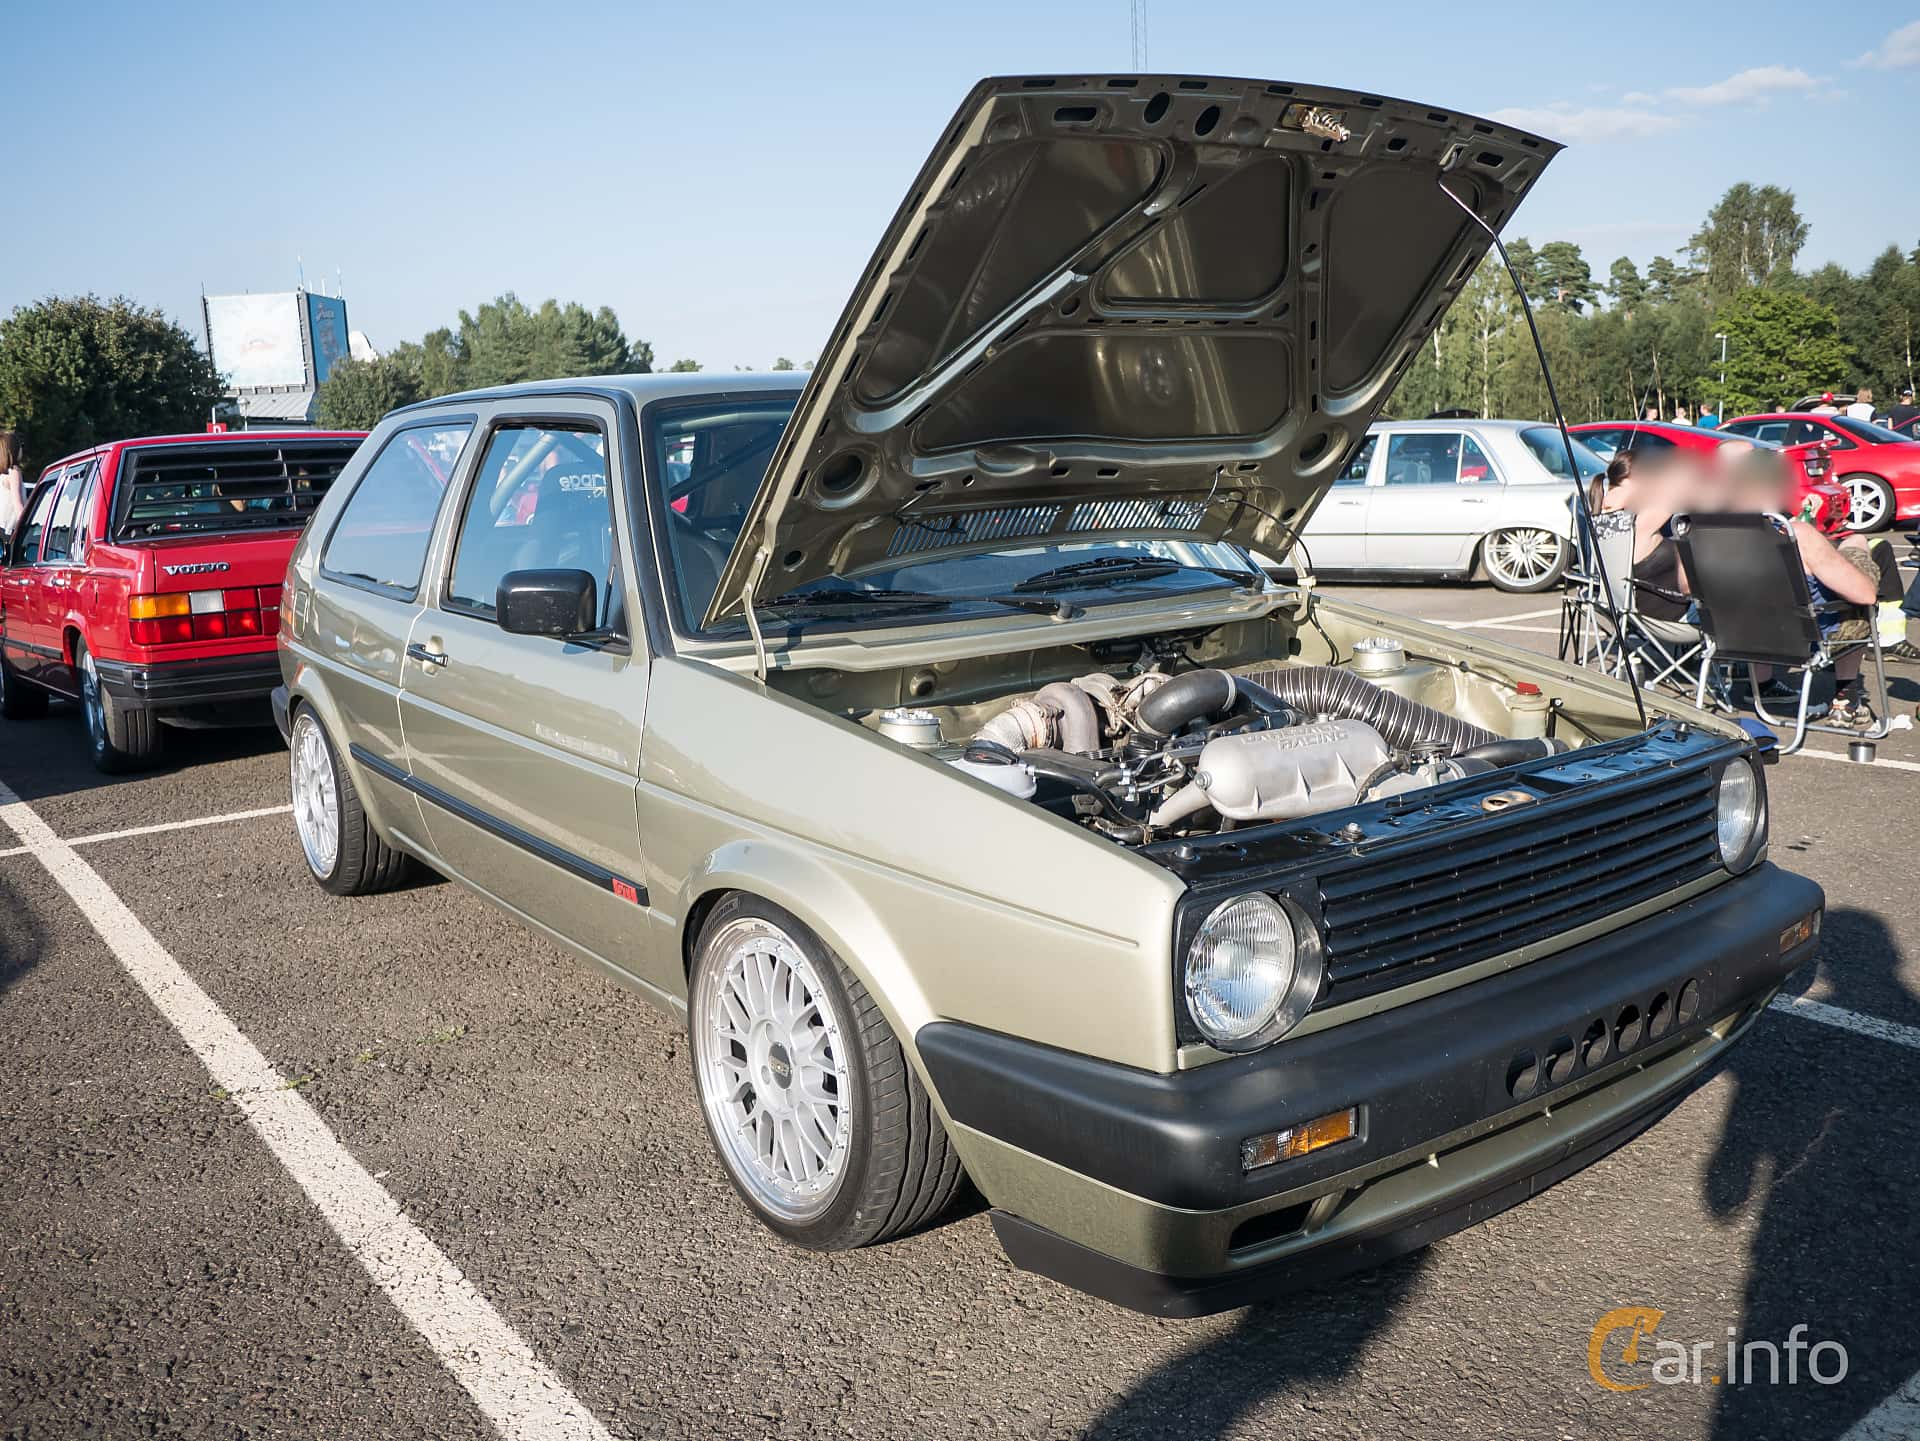 3 Images Of Volkswagen Golf Gti Door 18 Manual 136hp 1990 By Front Side 136ps